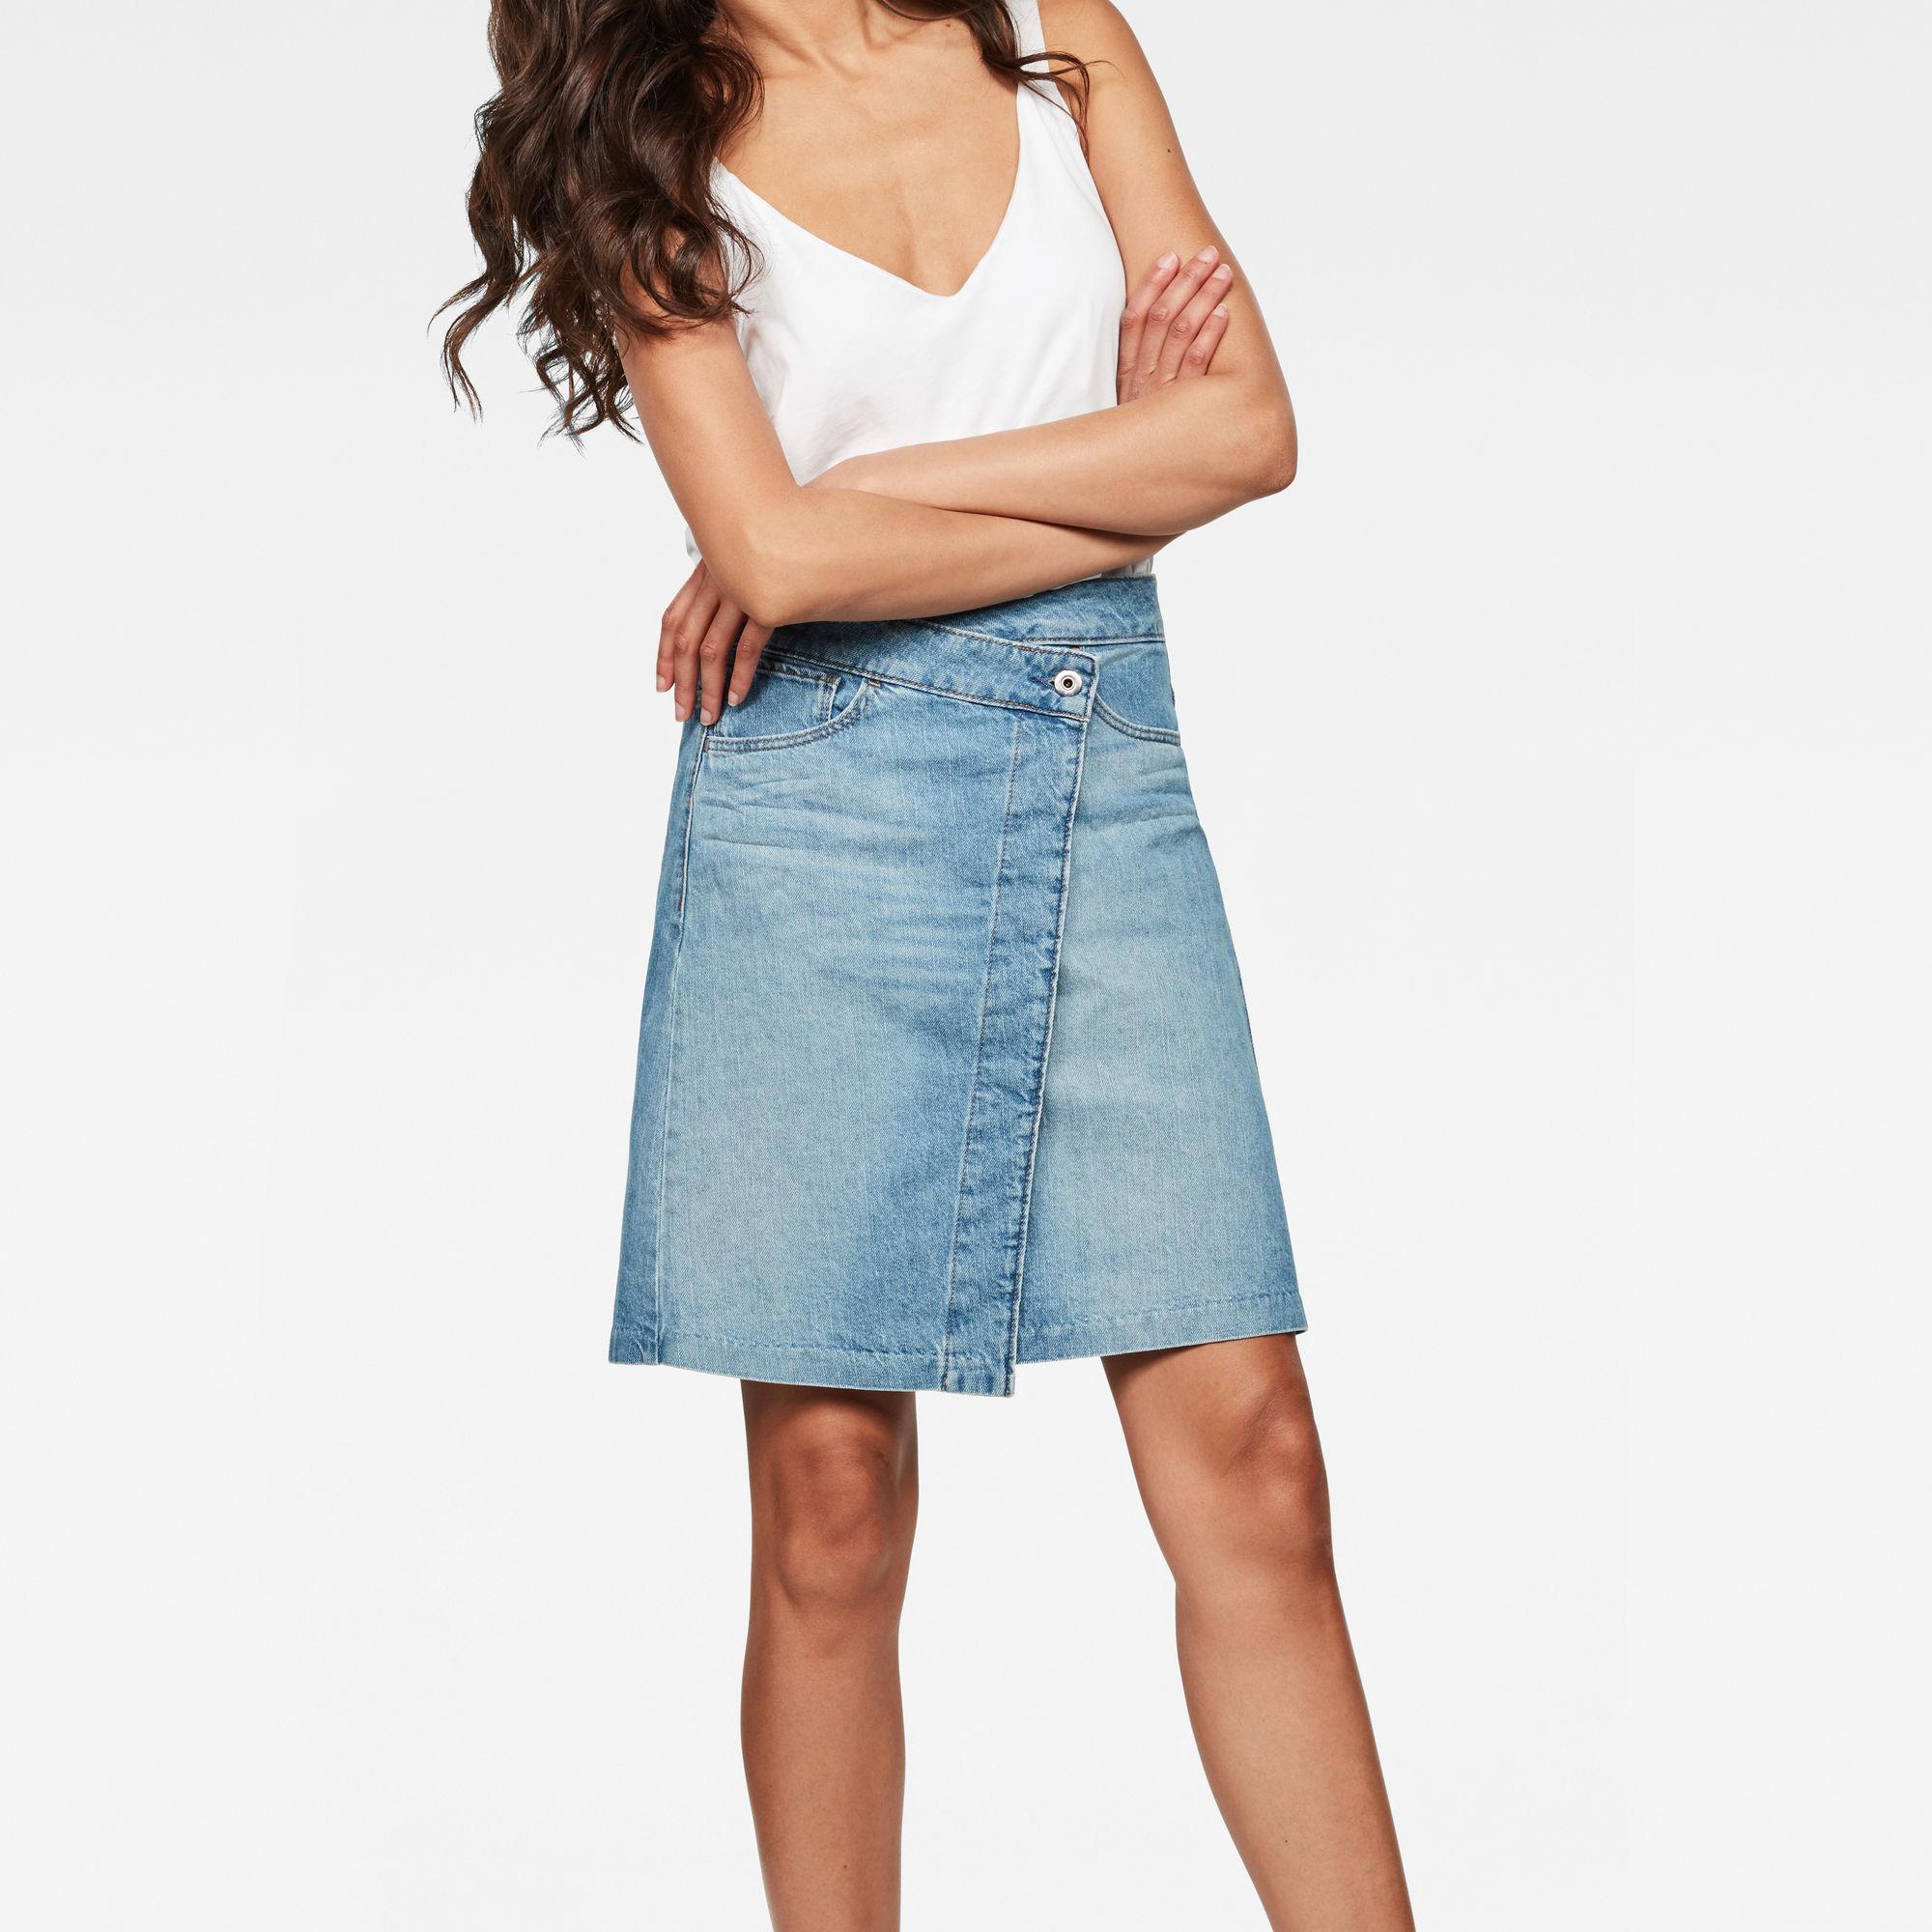 Image of Arc Wrap Skirt